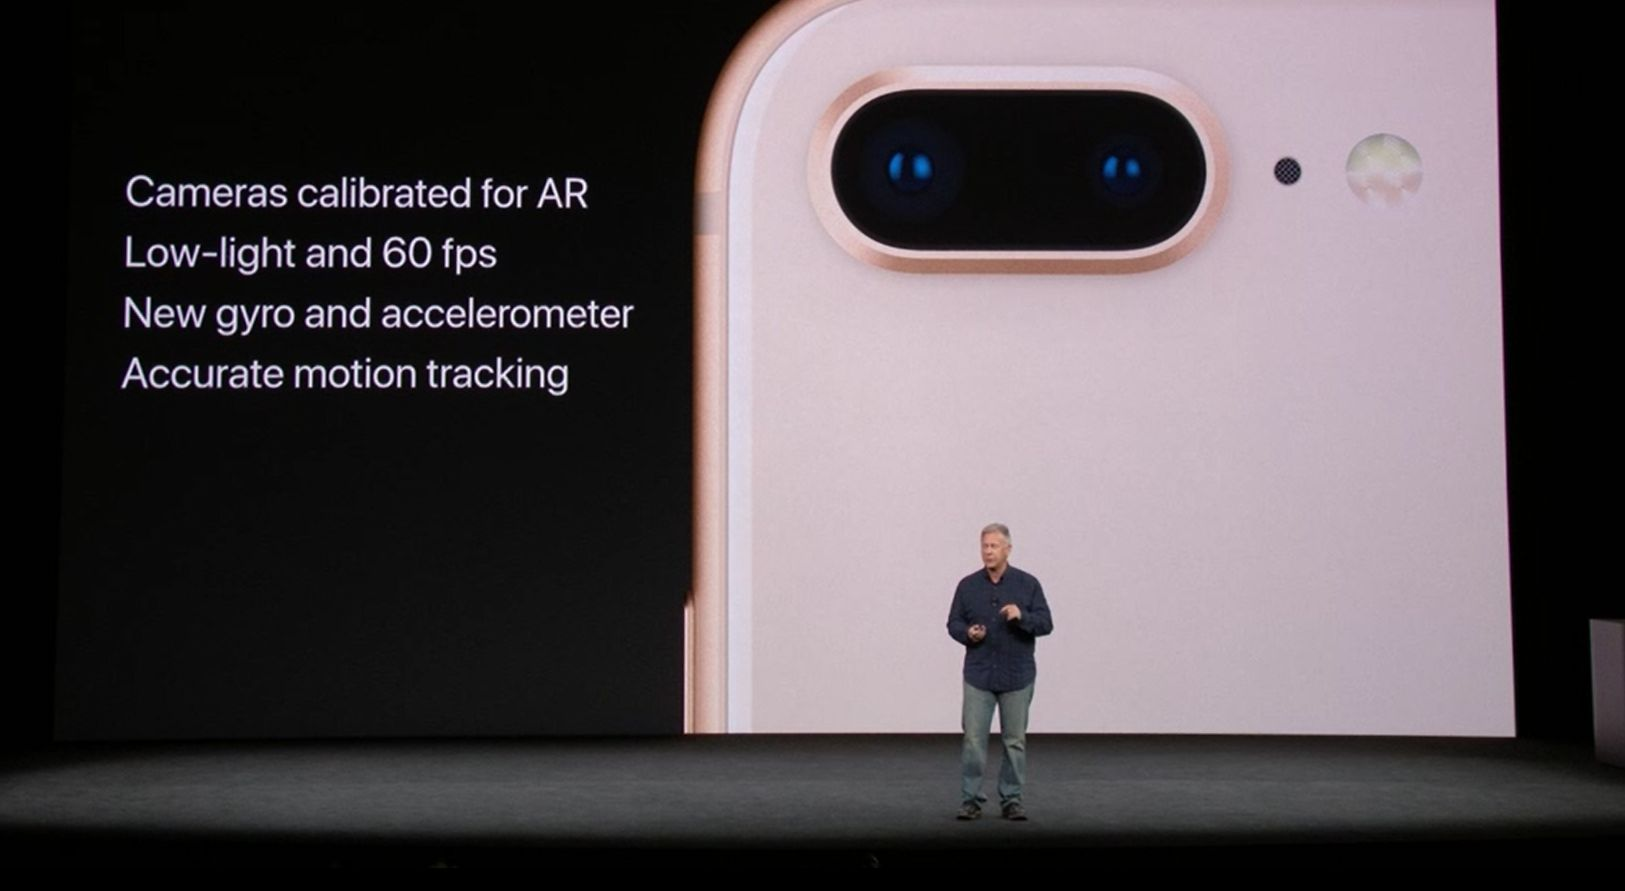 kamera w iphone 8 - AR, 60 FPS